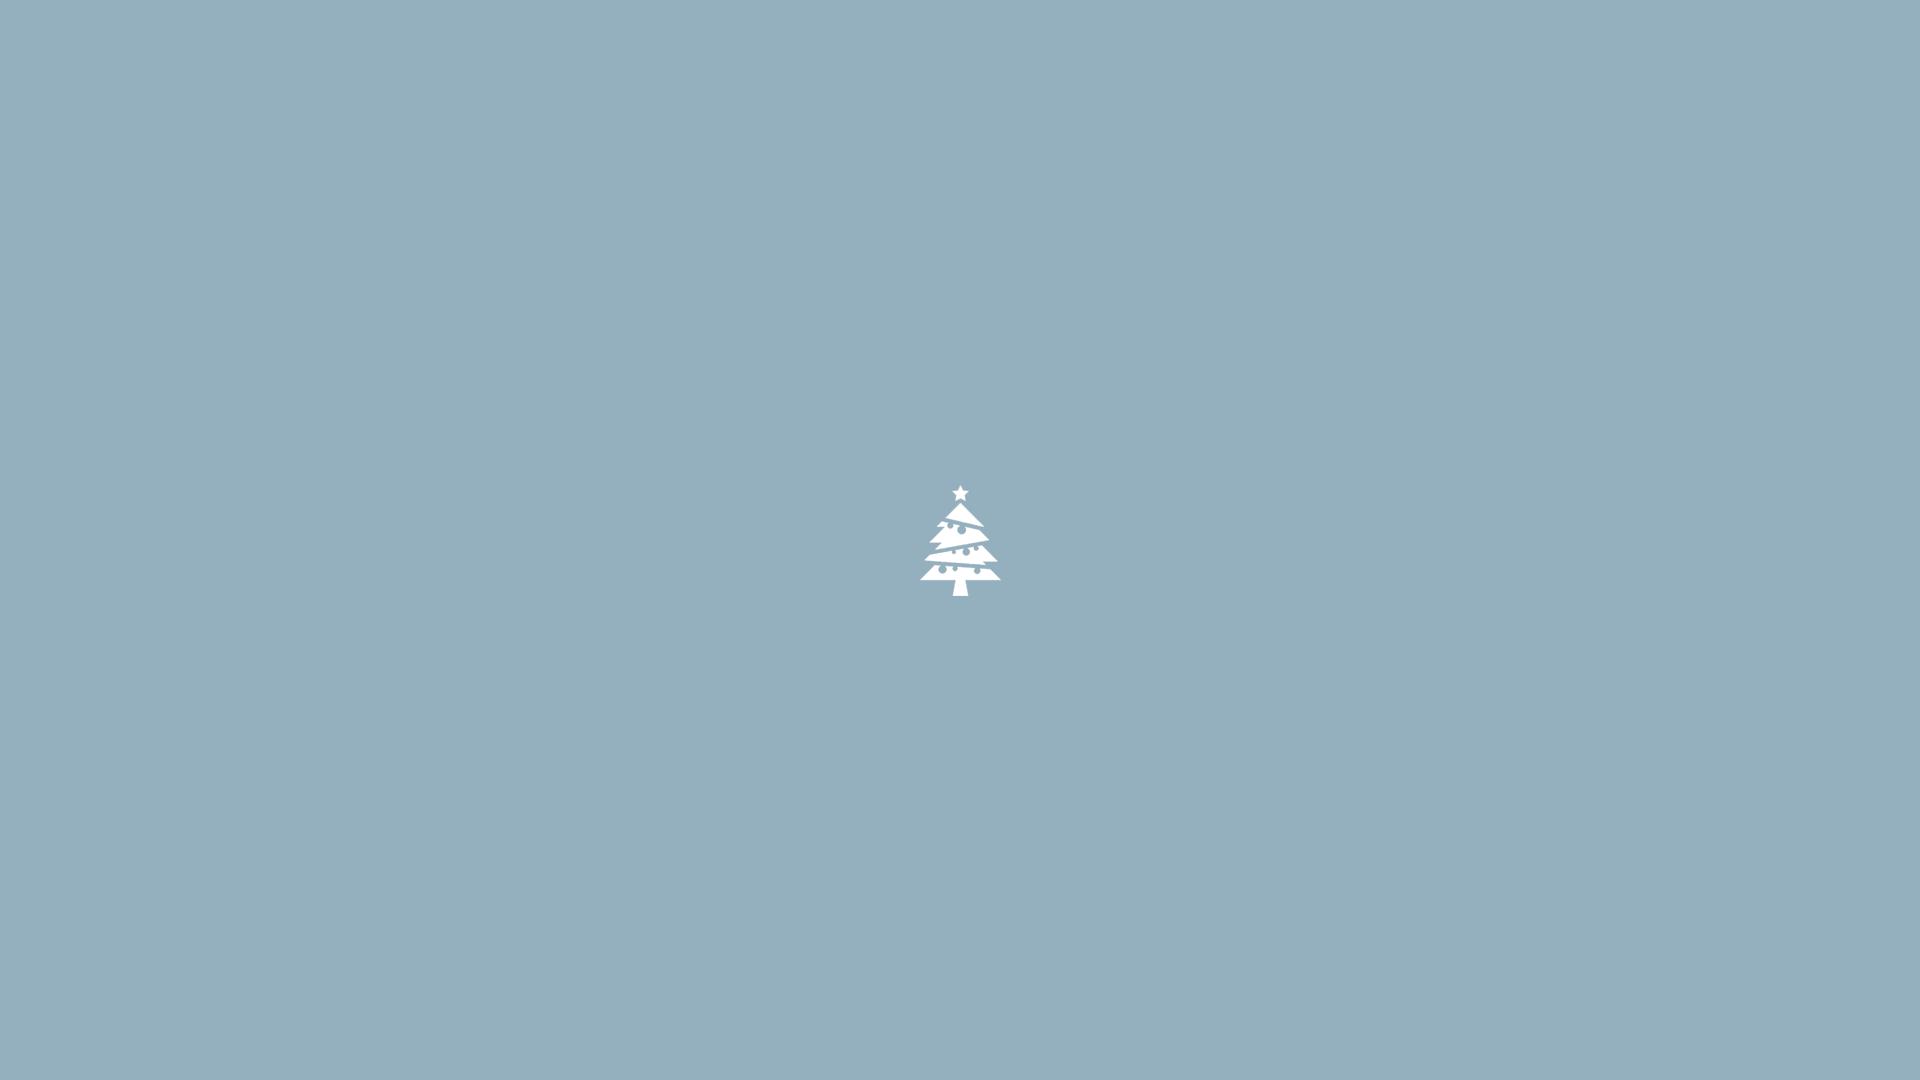 minimalist christmas tree wallpaper 1920x1080. Black Bedroom Furniture Sets. Home Design Ideas